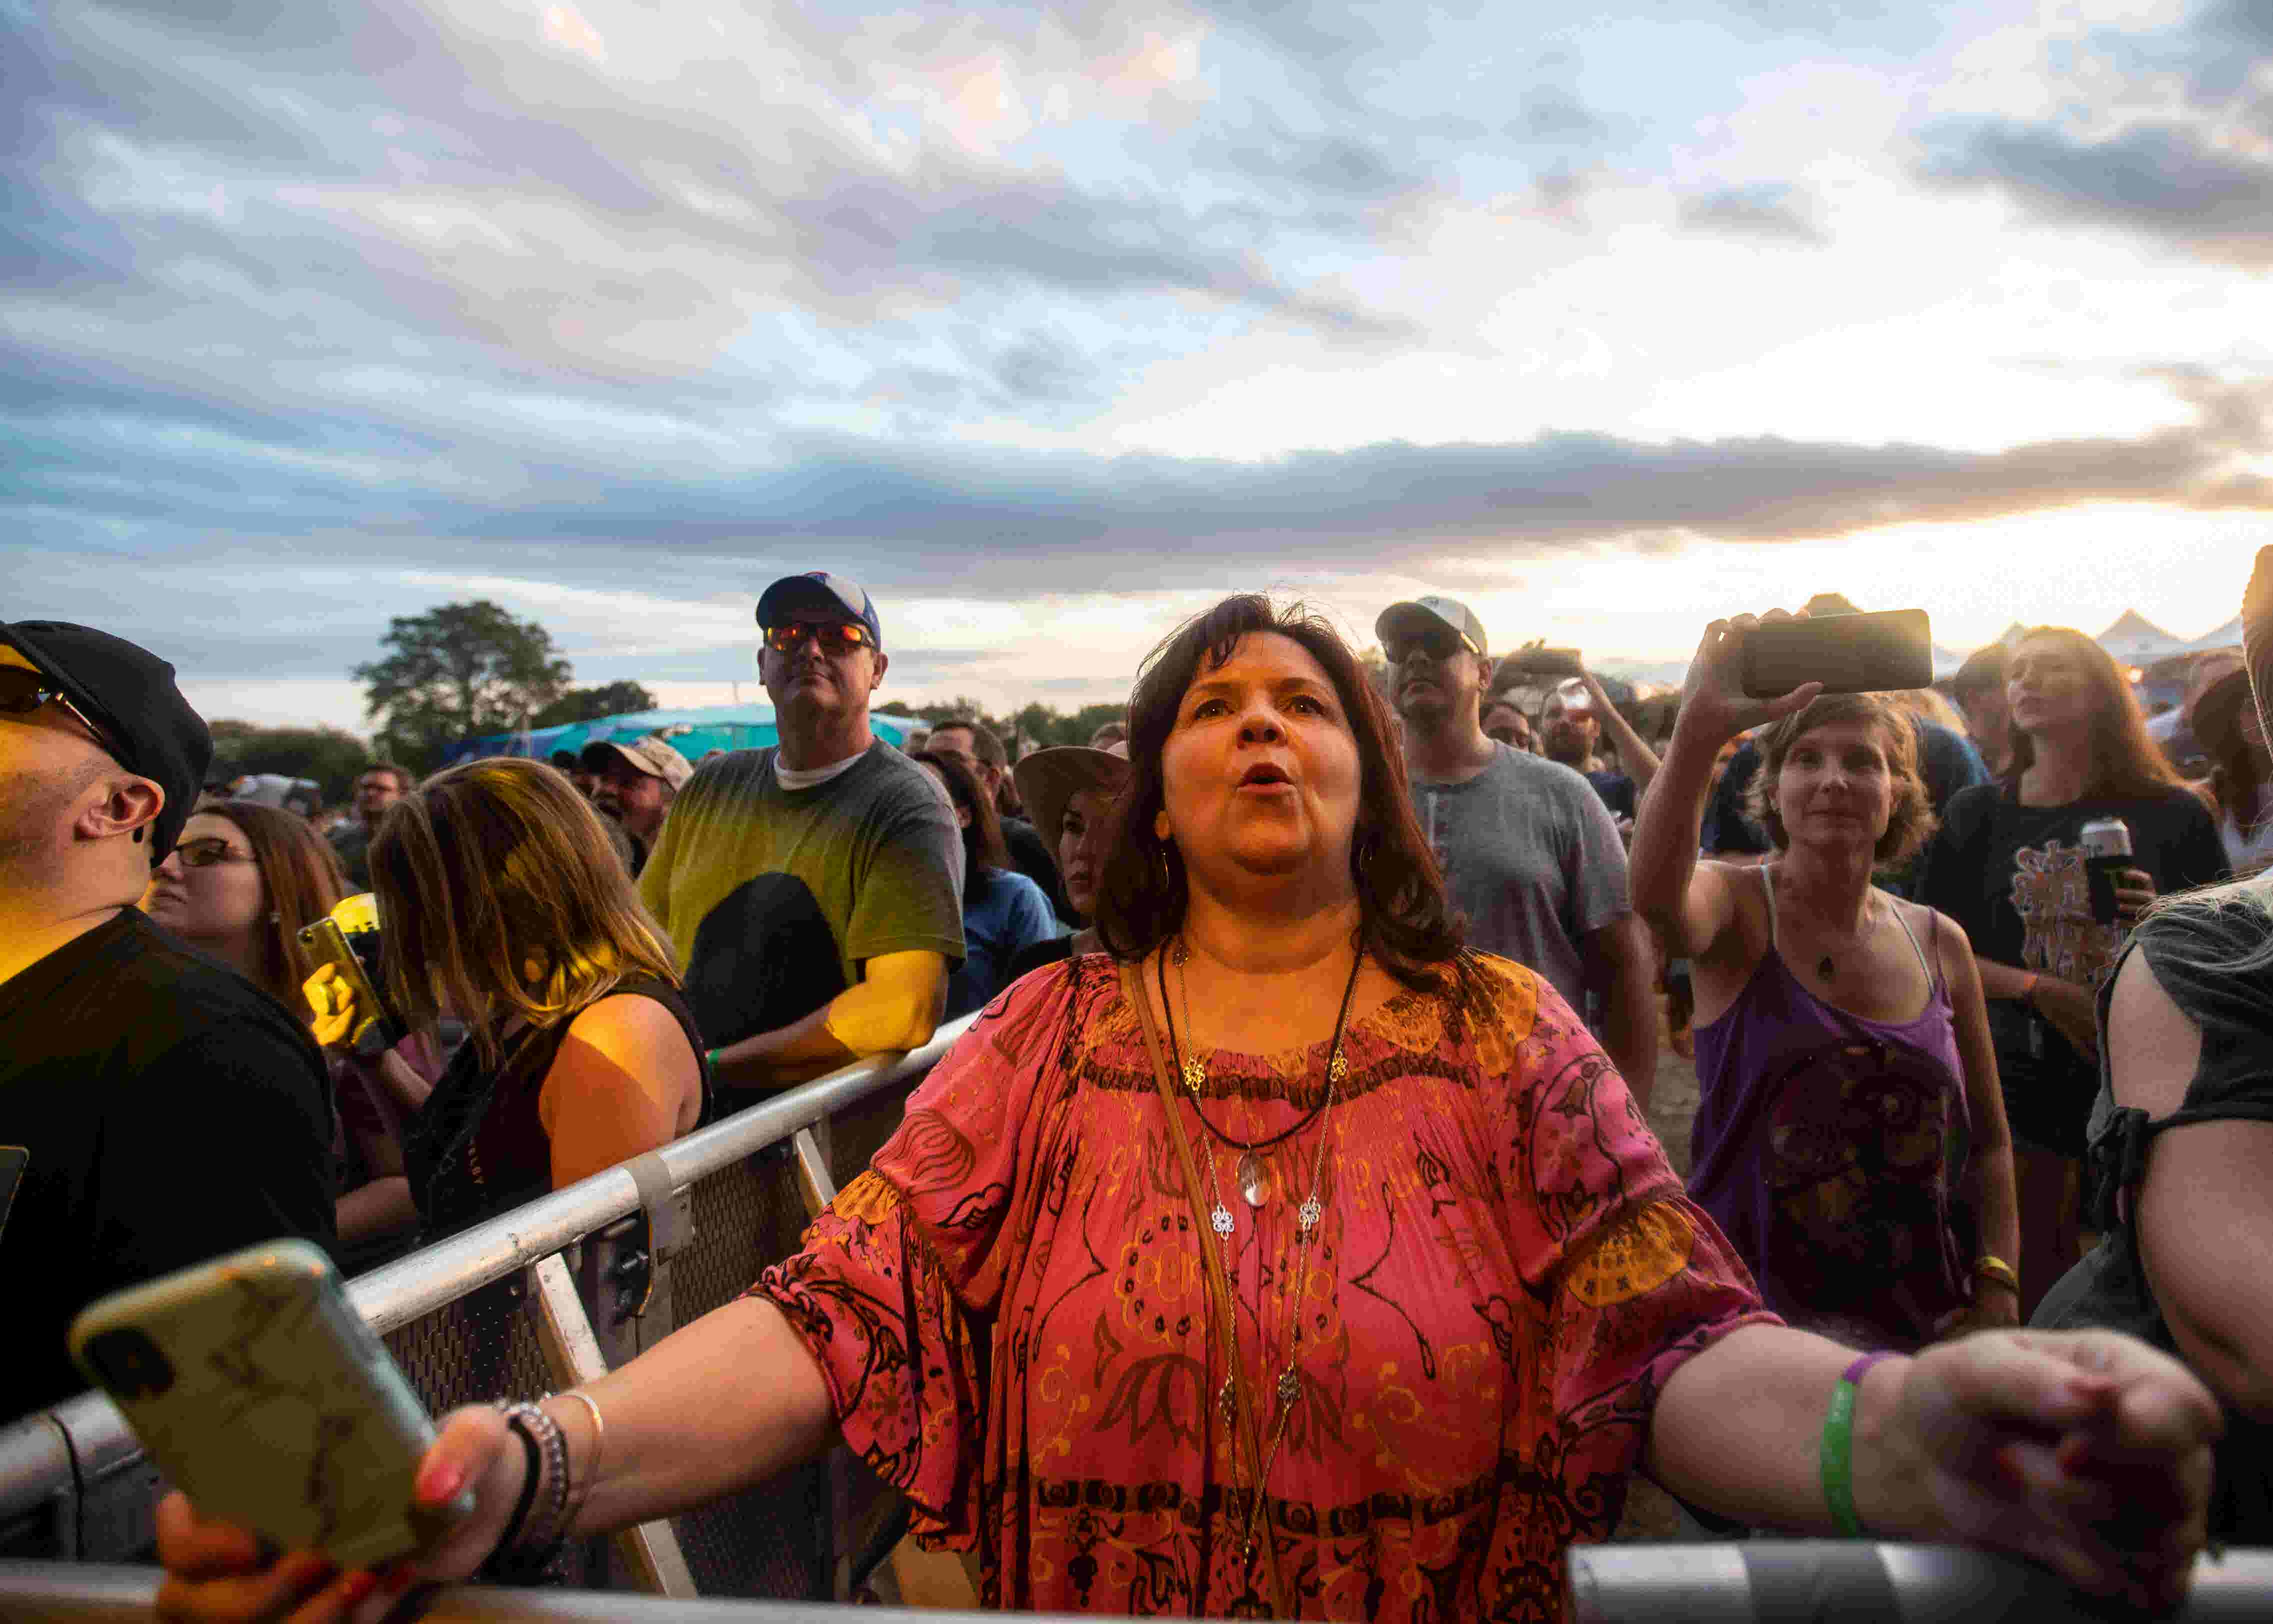 Grammy winner Brandi Carlile closes out Mempho Music Festival